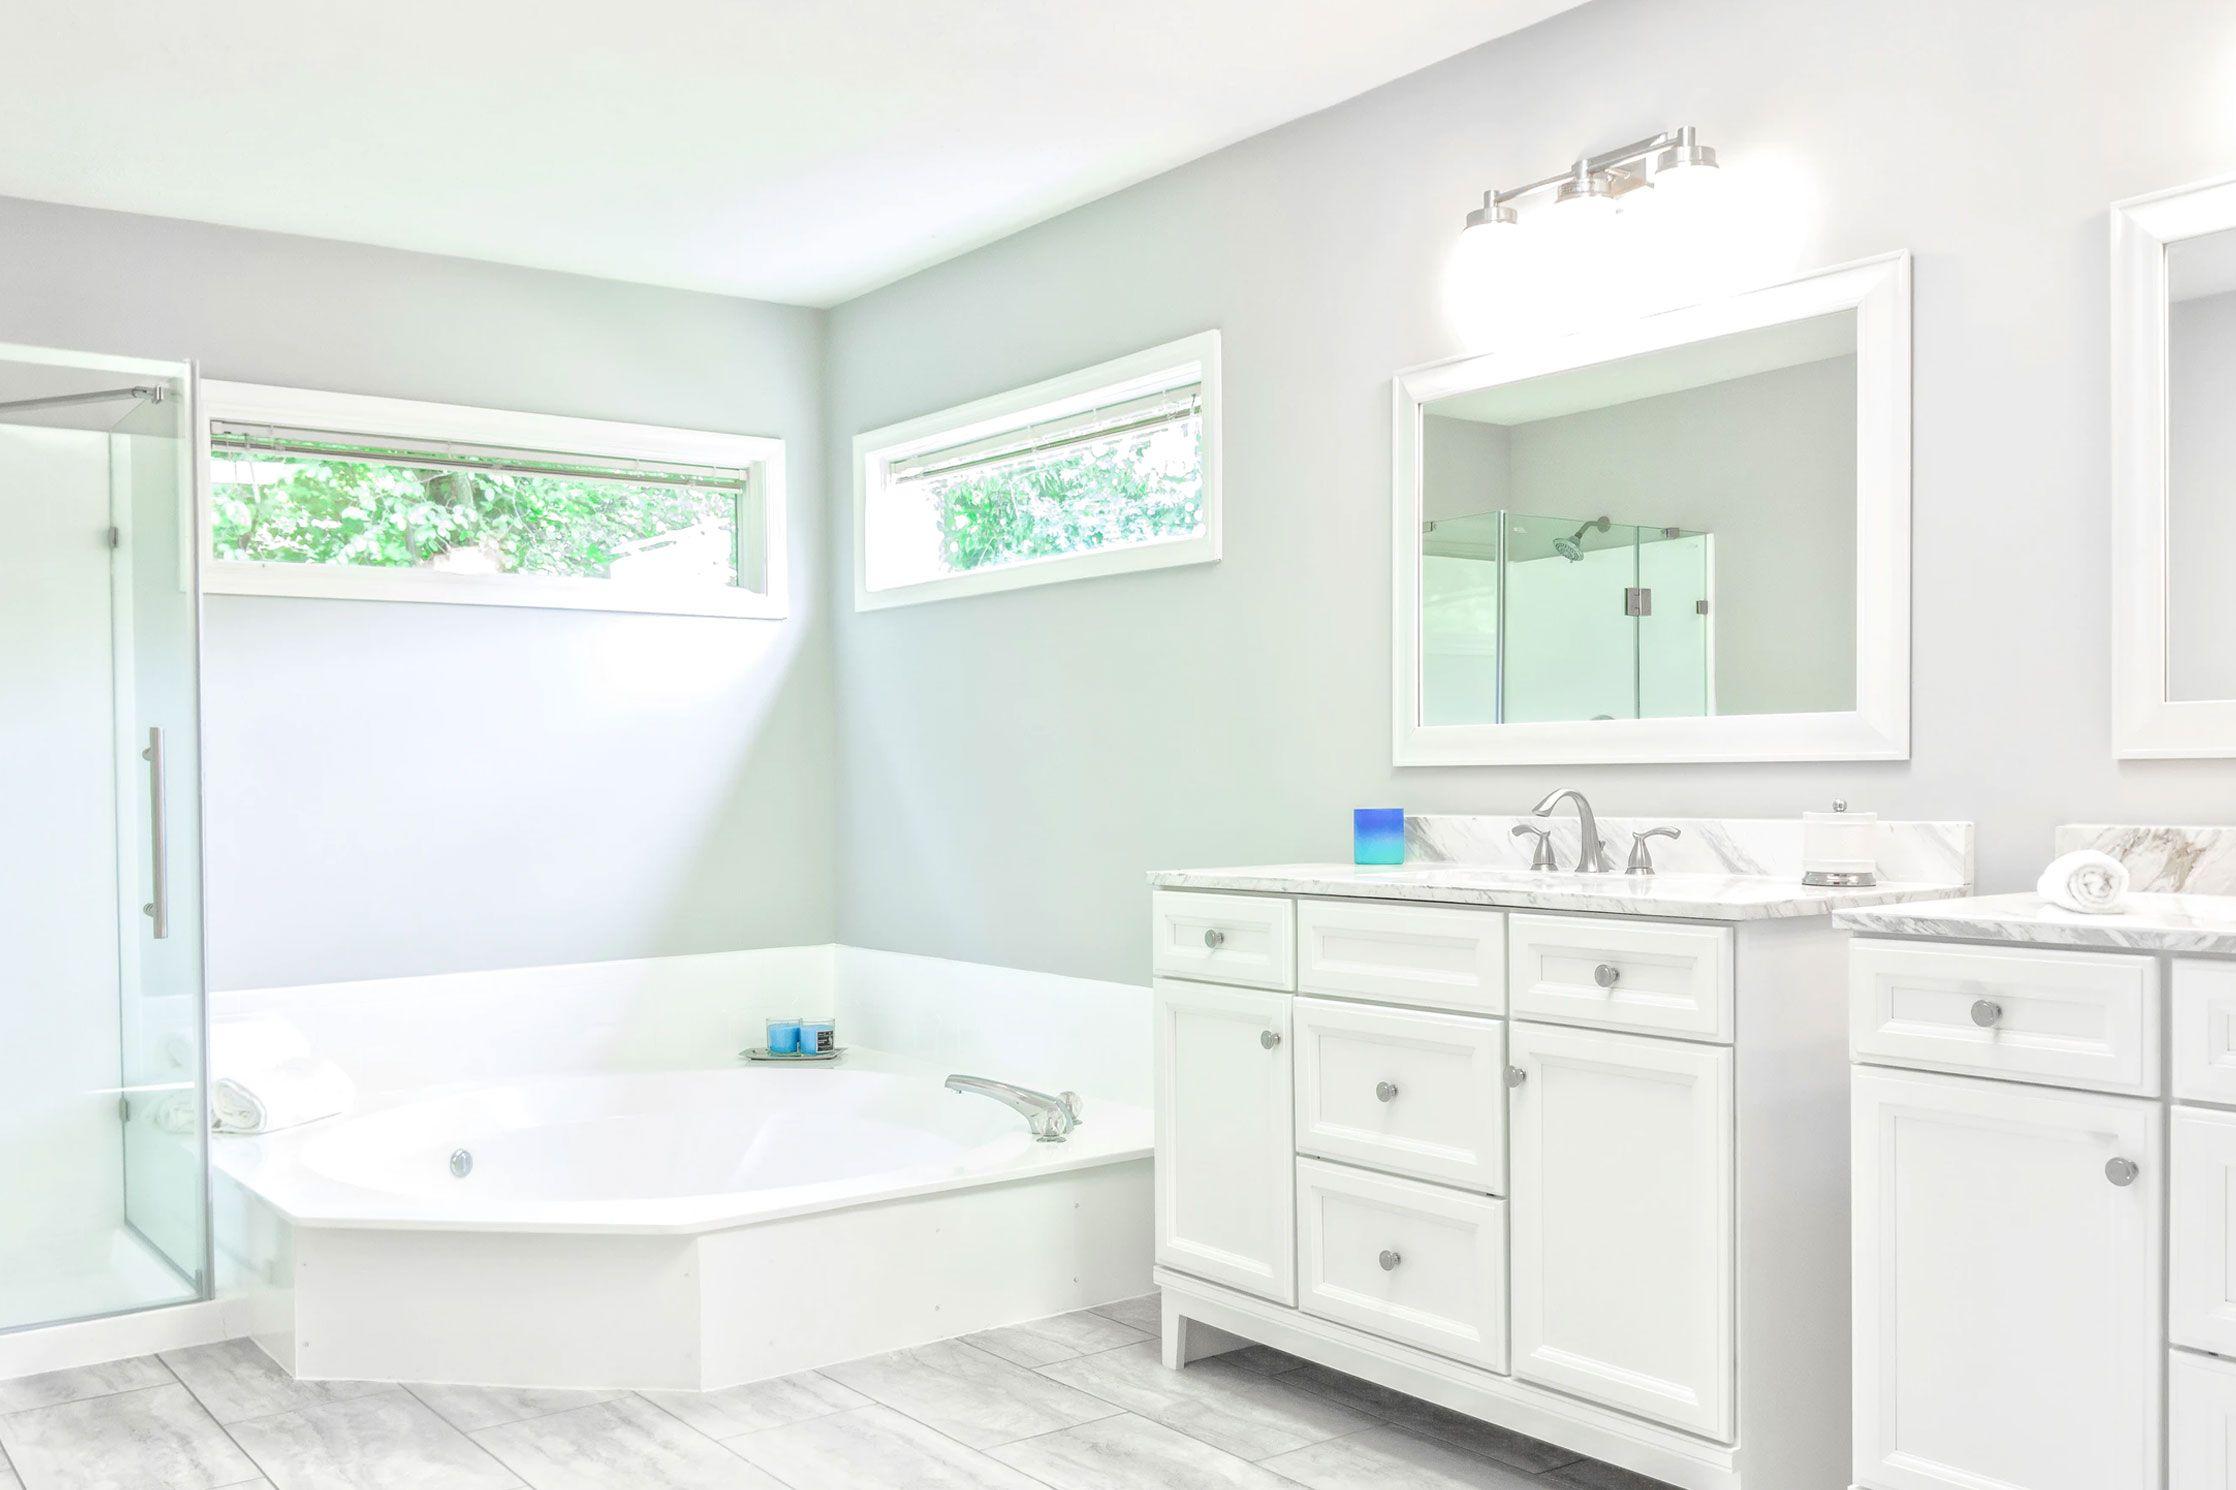 Plumbing Repairs work-familybathroom-featured